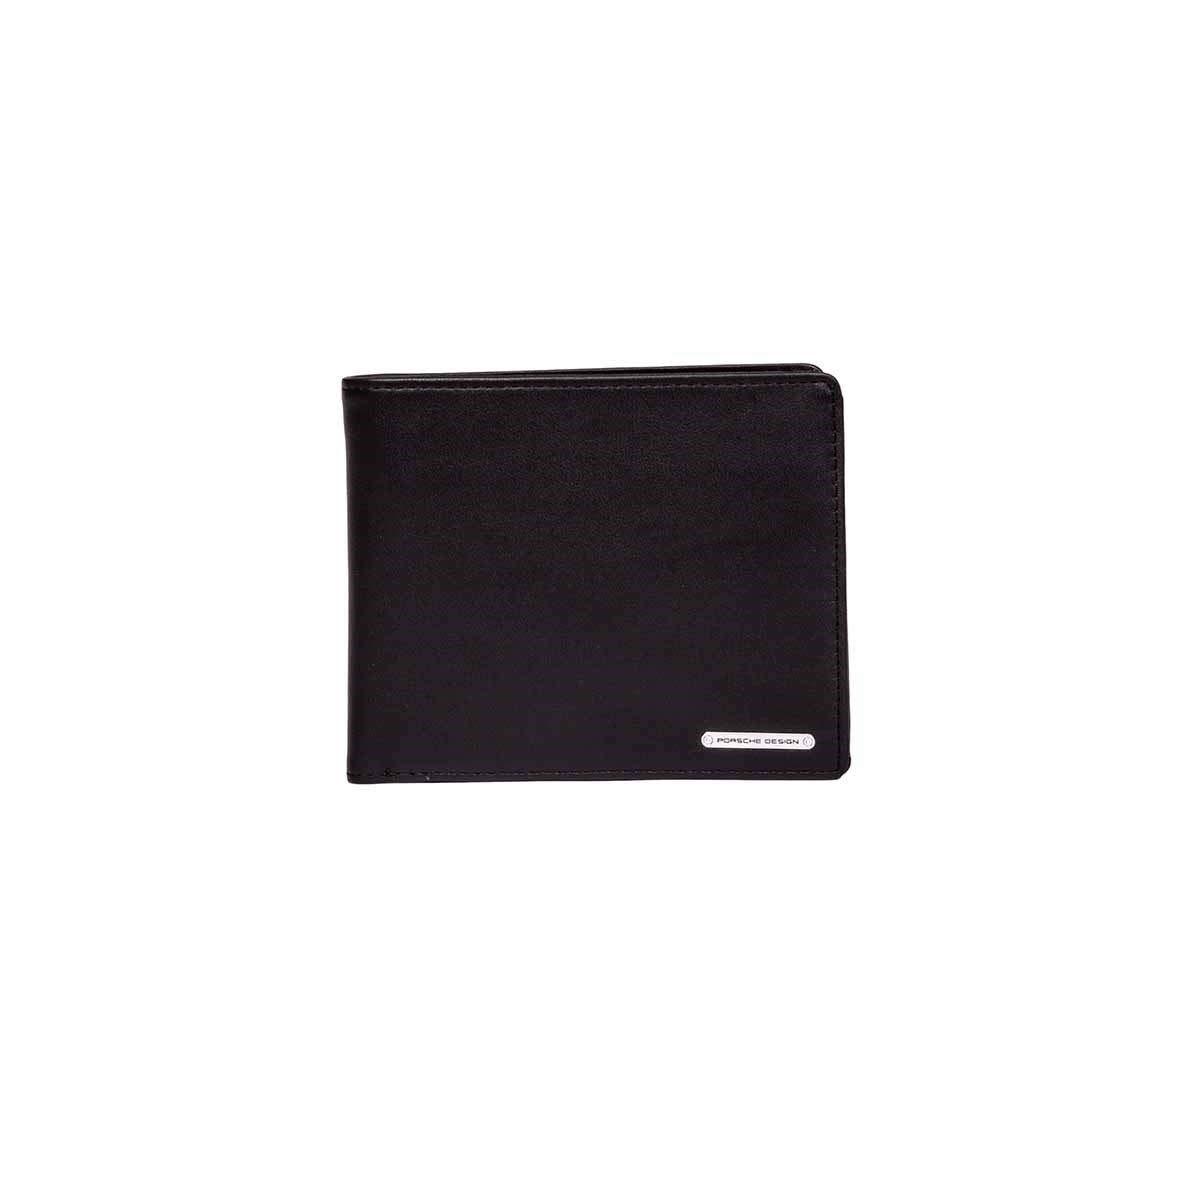 Porsche Design Women's 4090000214900 Black Leather Wallet